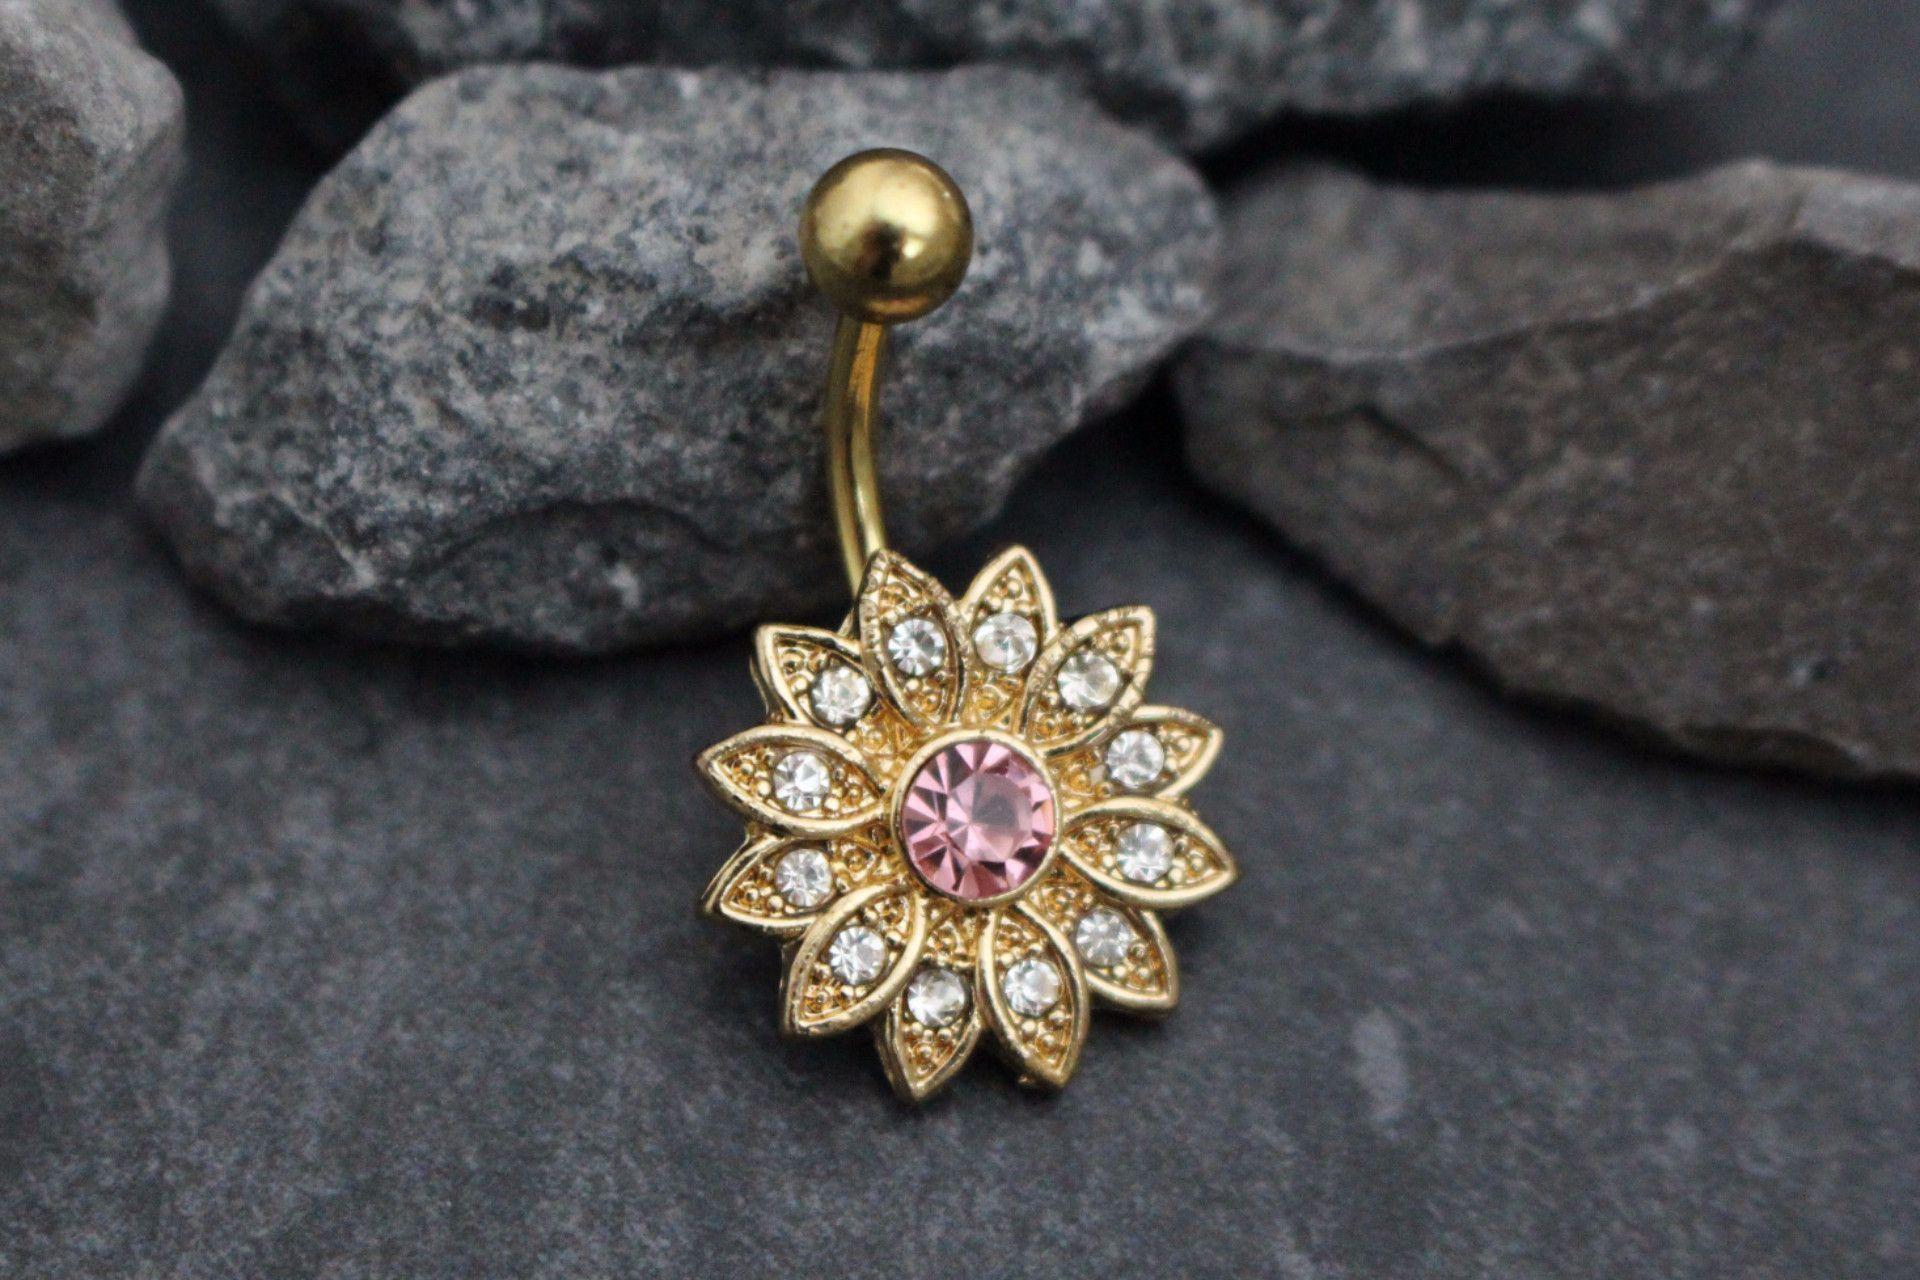 Belly button piercing stud  Petal Flower Belly Button Ring Stud  Trendy Jewelry  Pinterest